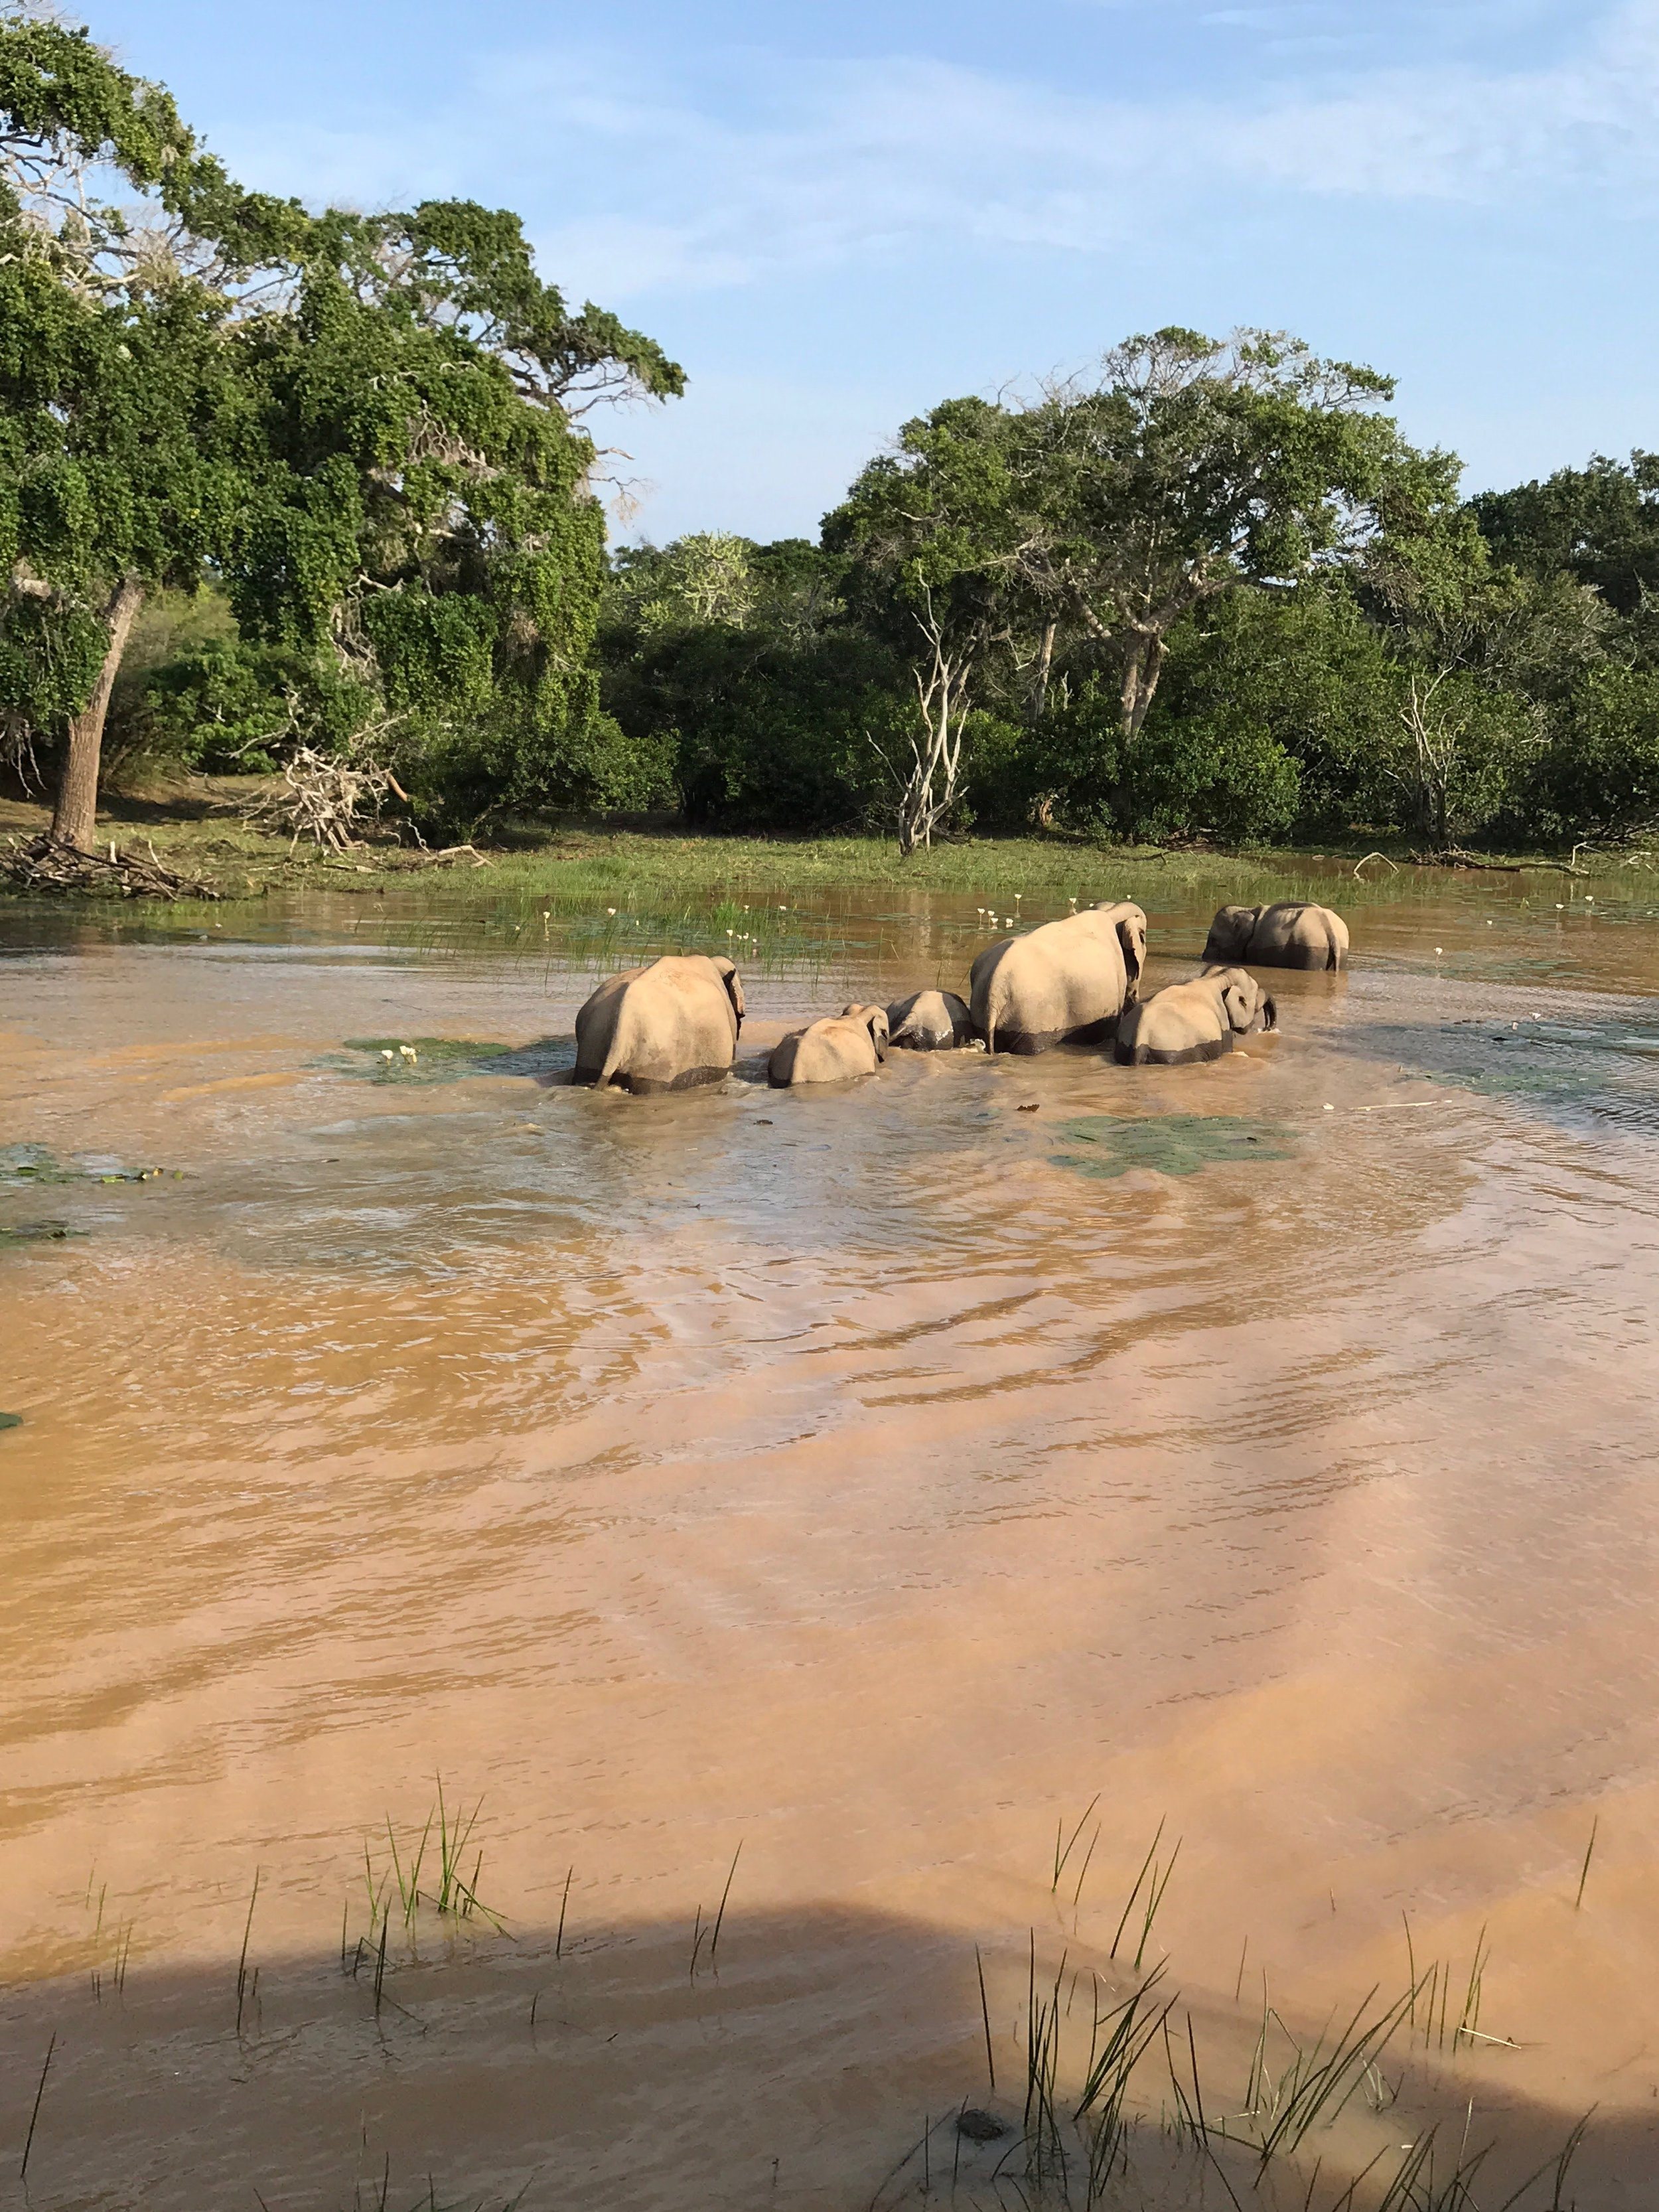 invite-to-paradise-maldives-sri-lanka-specialists-experts-travel-agent-tour-operator-customer-feedback-lucas-emily-fenning-elephant-safari.jpg